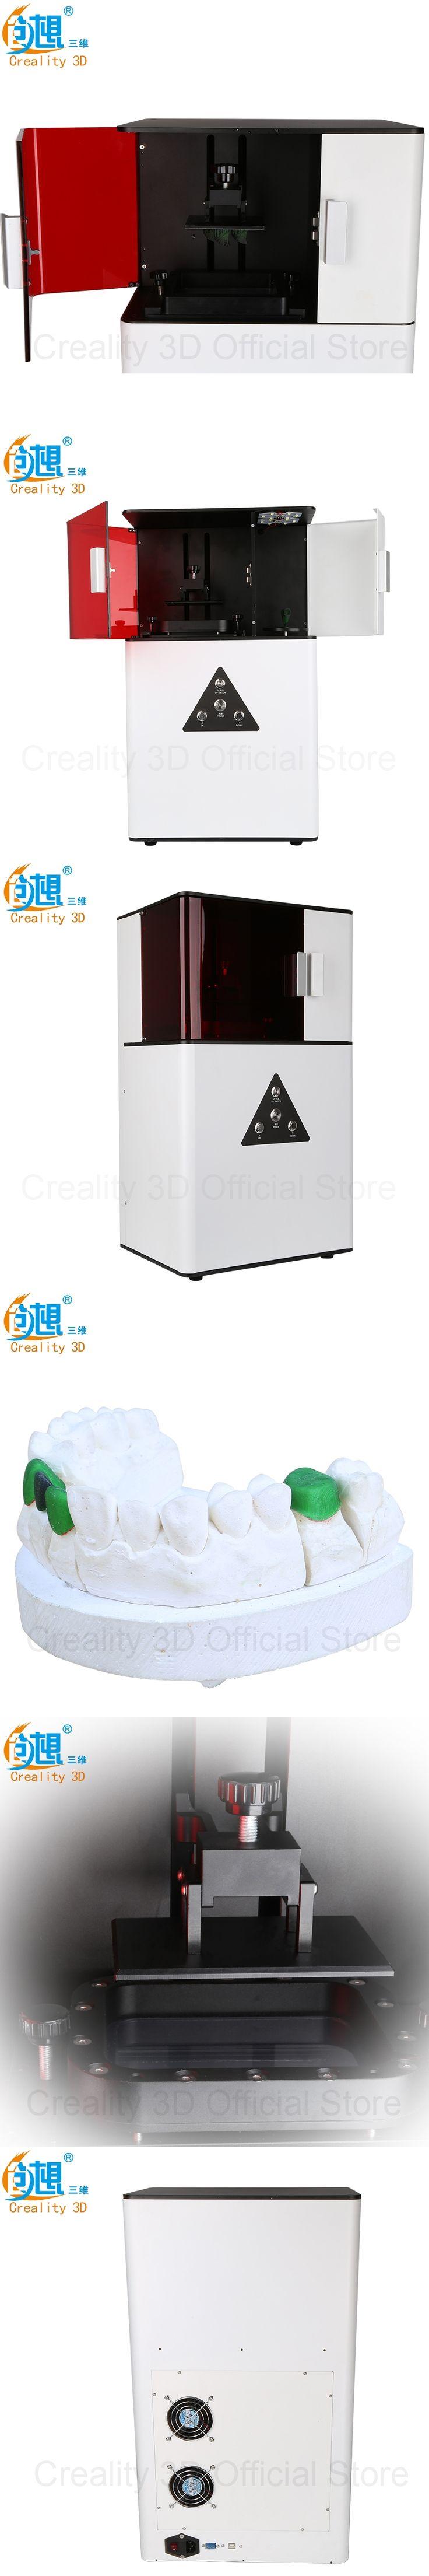 3 D Printer CREALITY 3D DLP 3D Printer Printing wax / casting /UV resin LCD light curing DP-001 tooth jewelry Cheap 3d printers